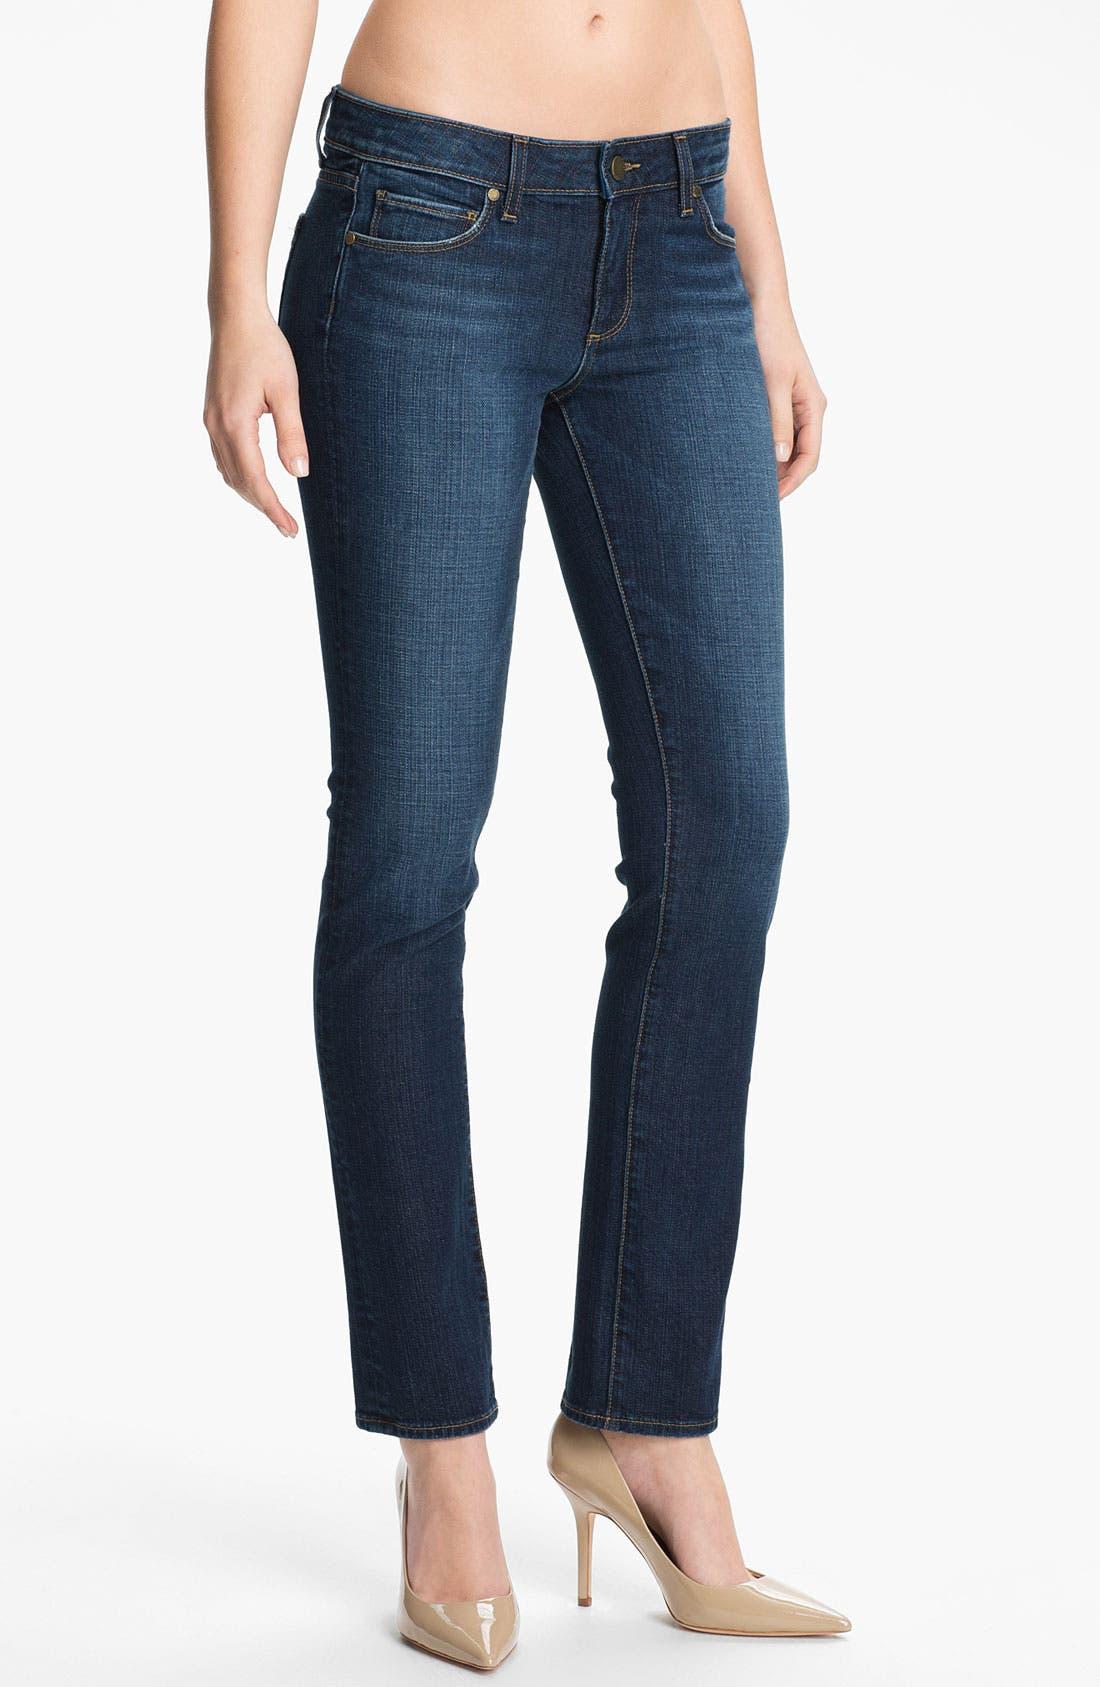 Alternate Image 1 Selected - Paige Denim 'Kelsi' Straight Leg Stretch Jeans (Carley)